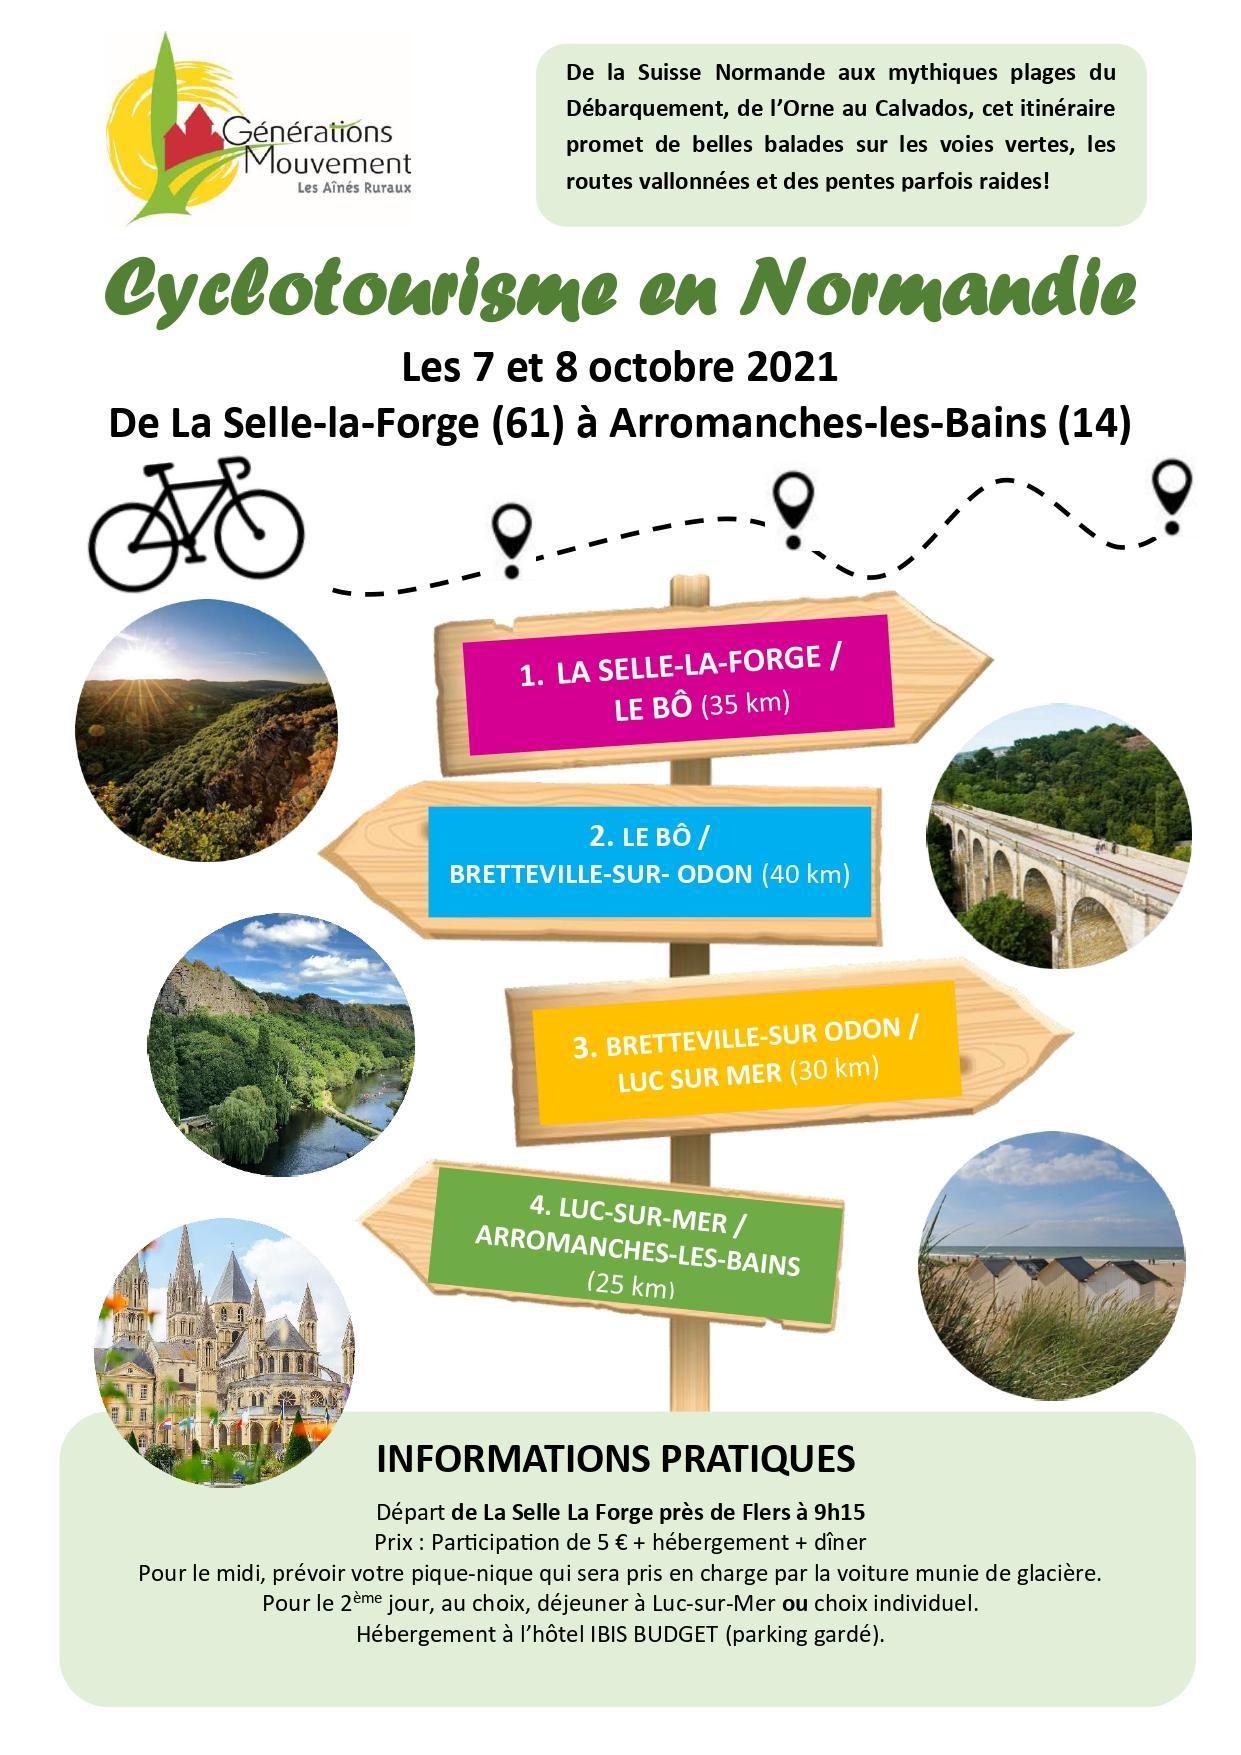 Cyclotourisme normandie page 0001